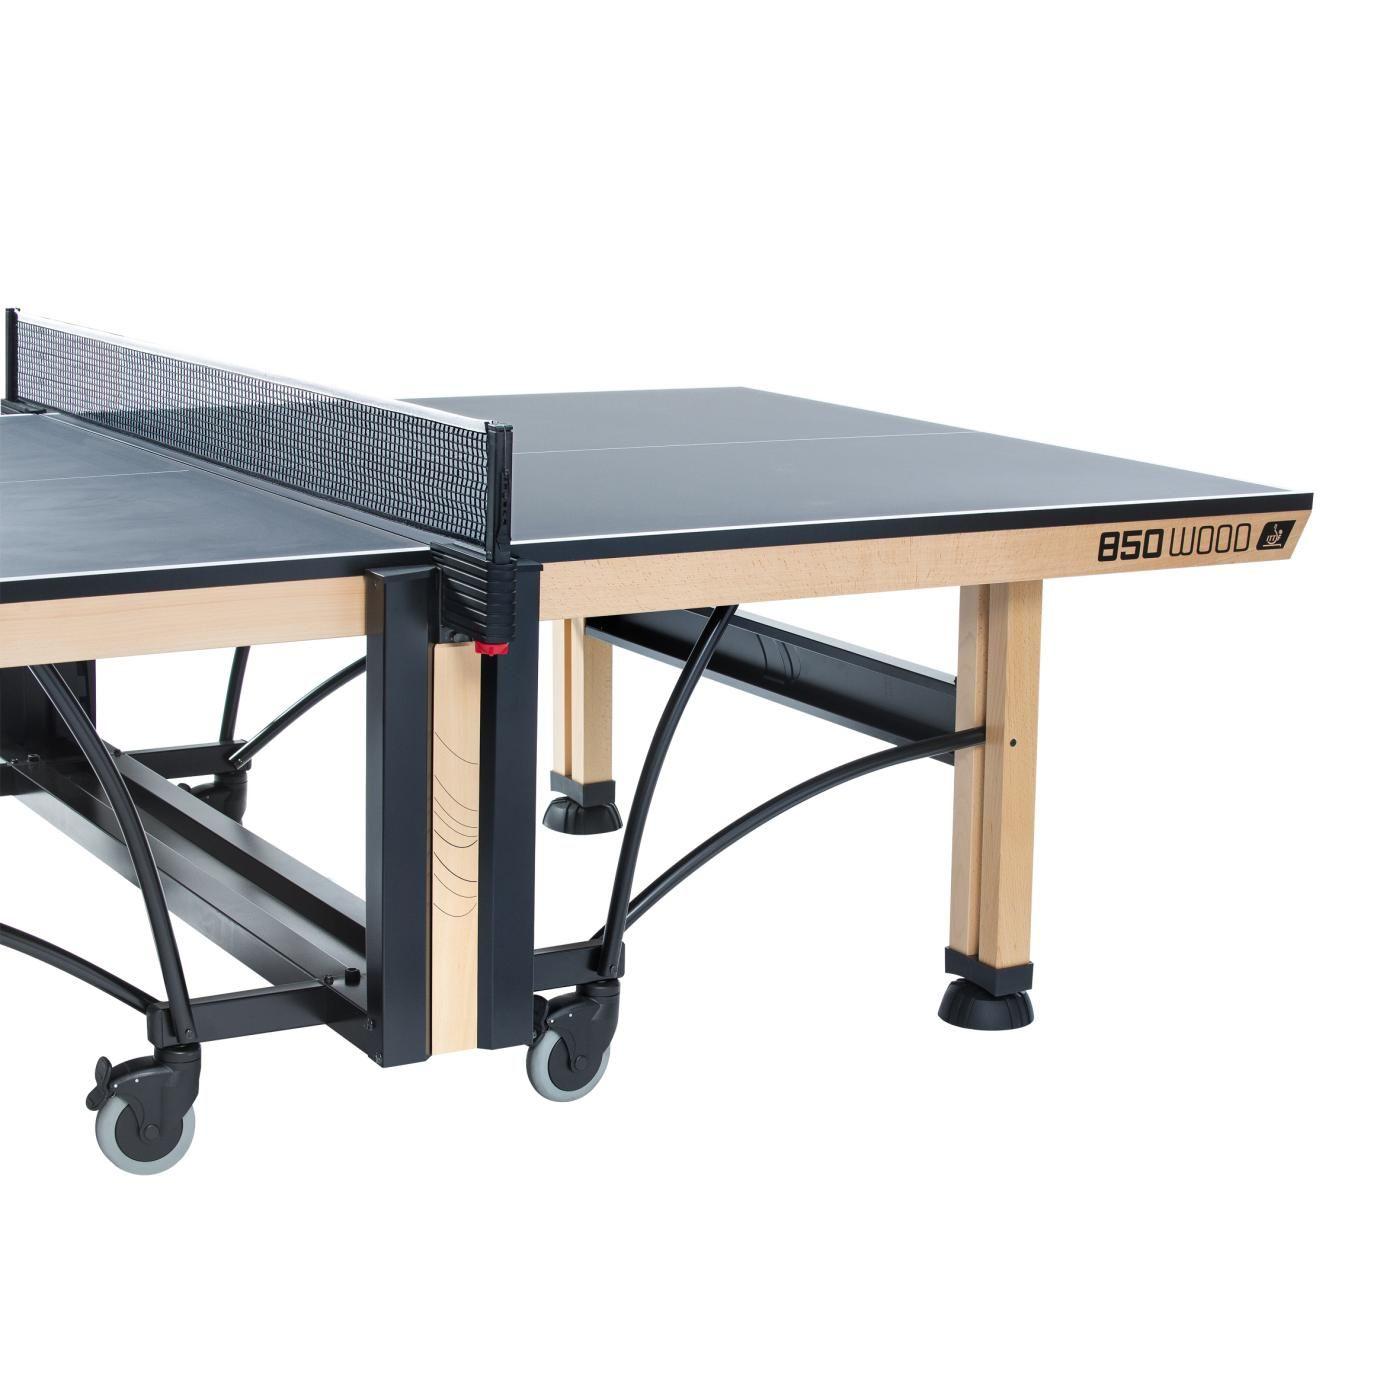 Cornilleau Competion 850 Wood ITTF